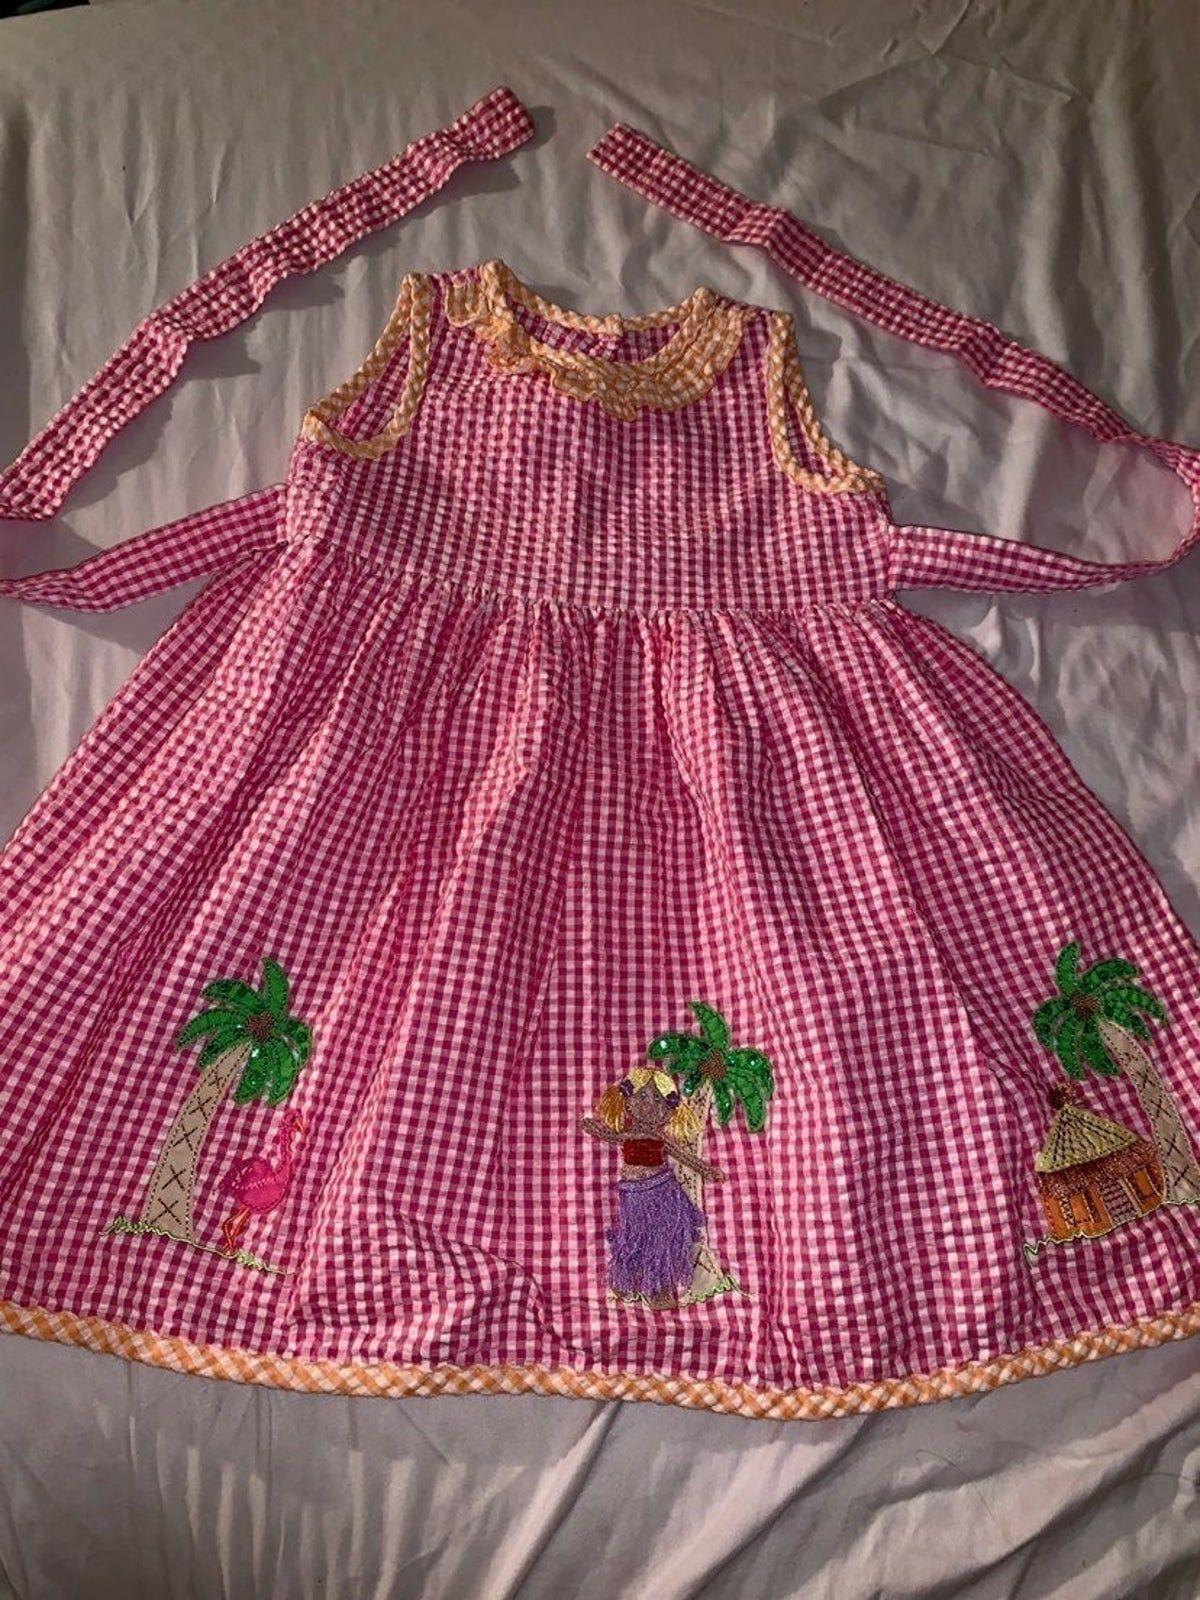 Pin By Silvia Escobar On Sil Bordado Summer Dresses Dresses 3t Dress [ 1600 x 1200 Pixel ]